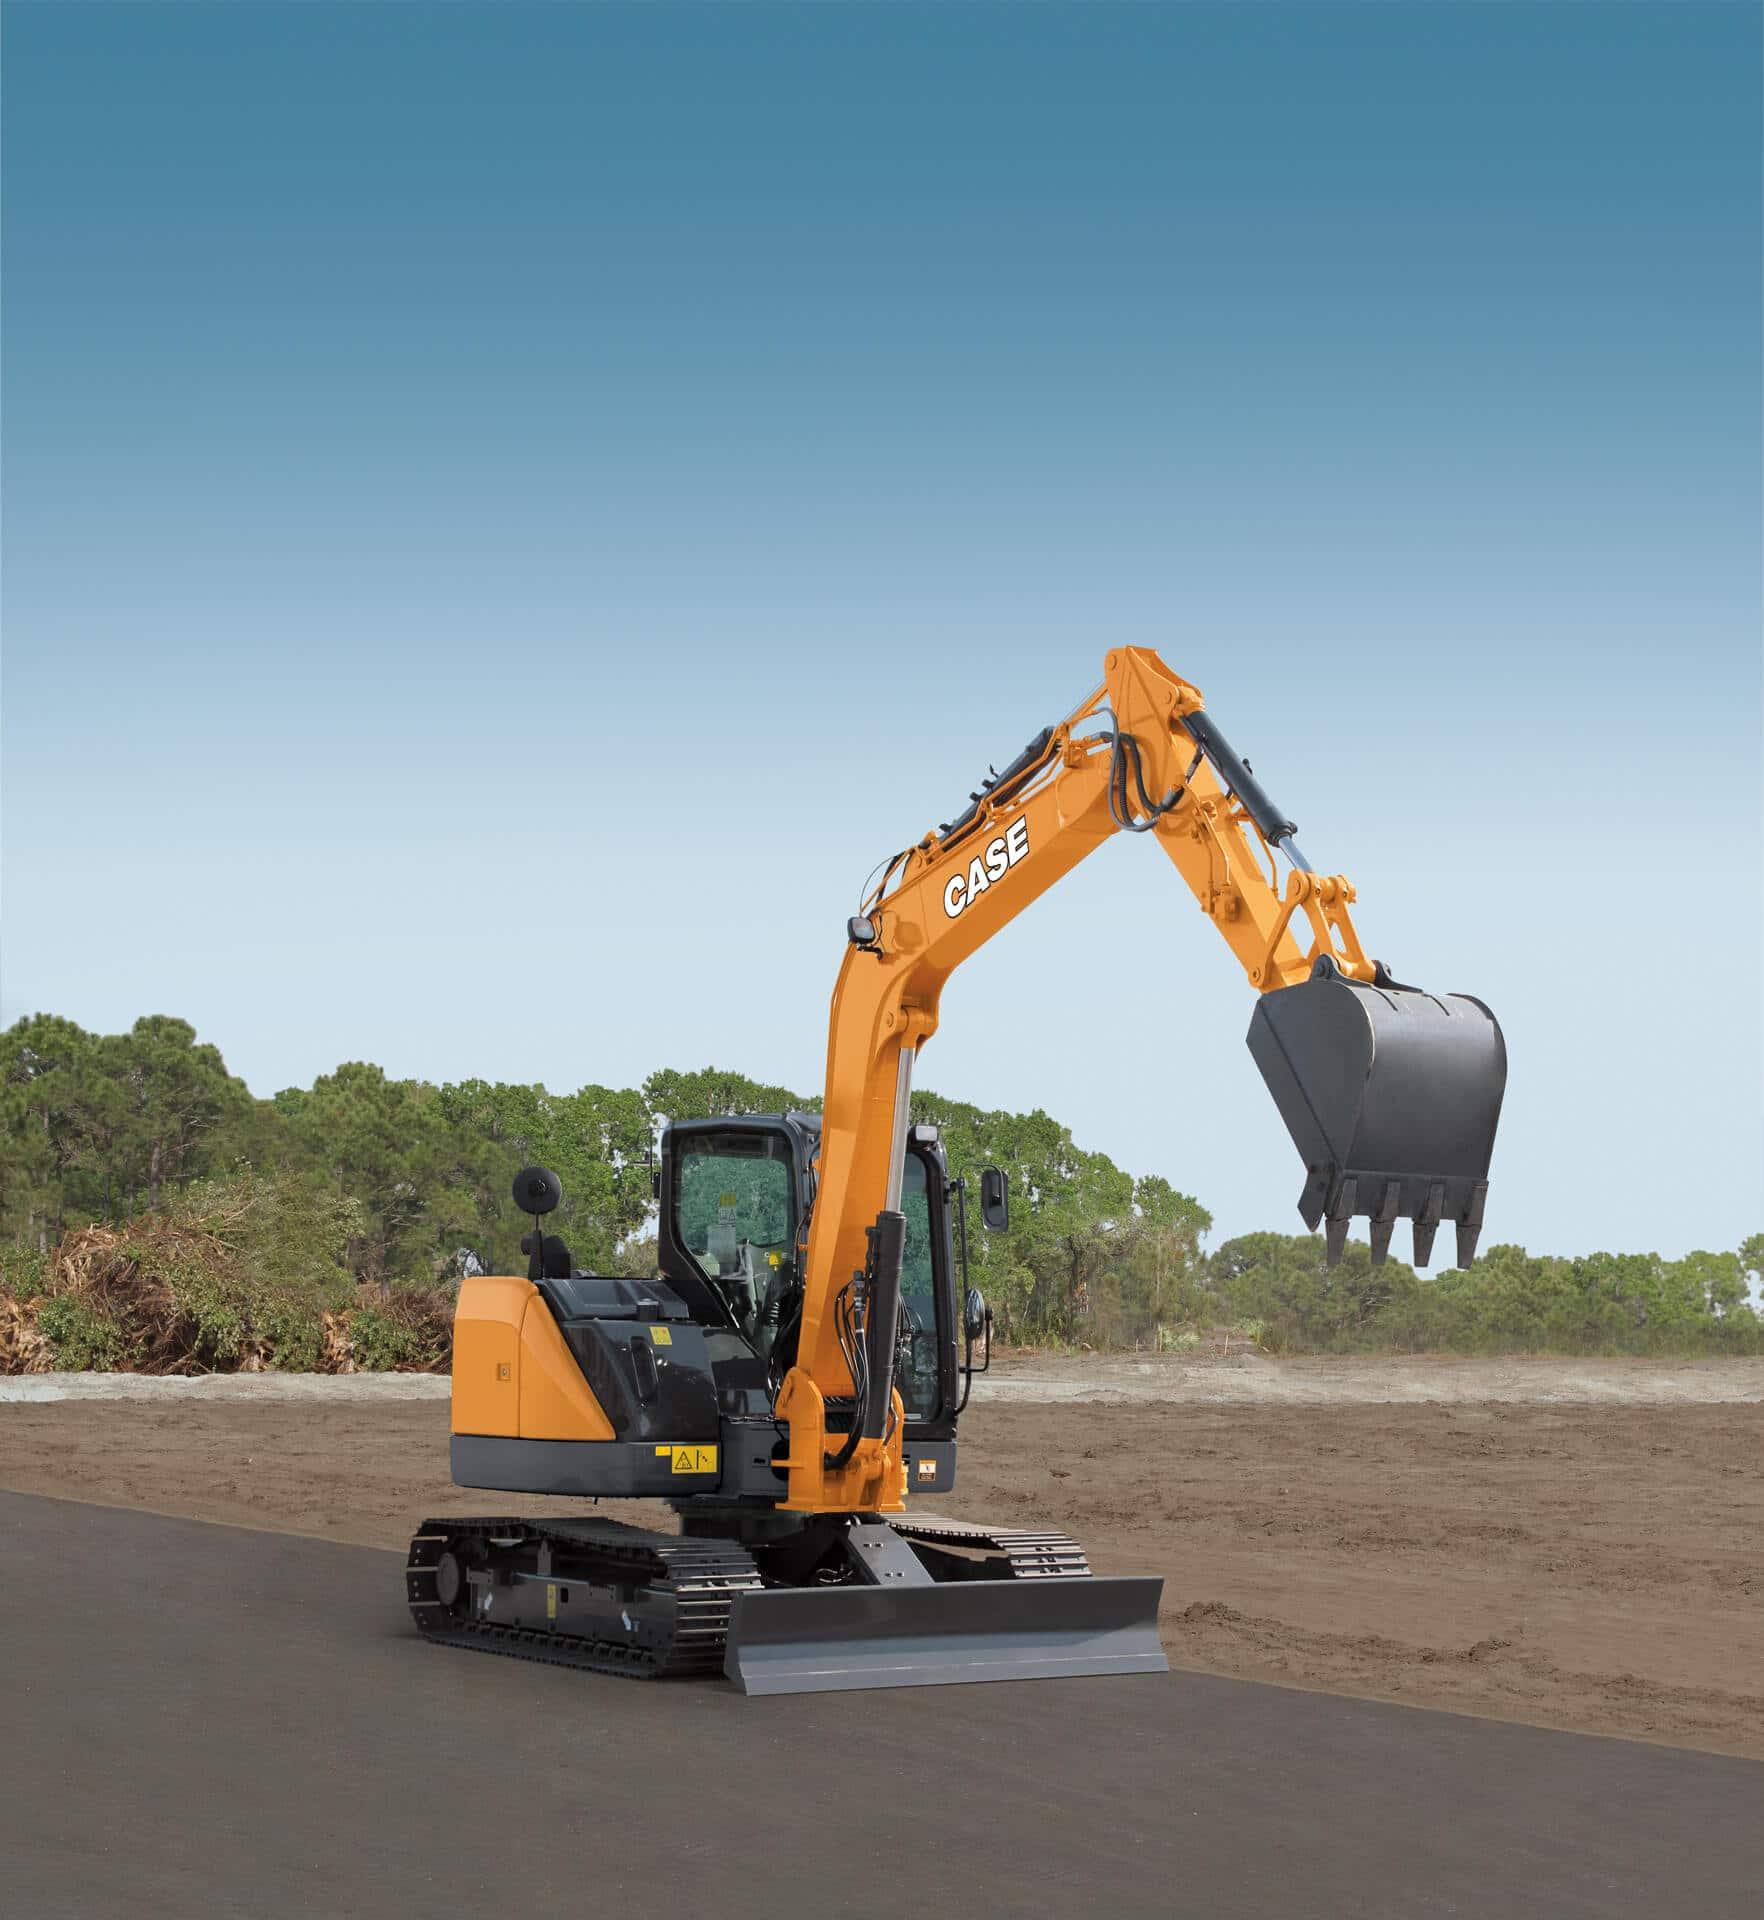 https://assets.cnhindustrial.com/casece/nafta/assets/Products/Excavators/Midi-Excavators/CX80C_IMG_2844r_effect.jpg?Width=800&Height=450